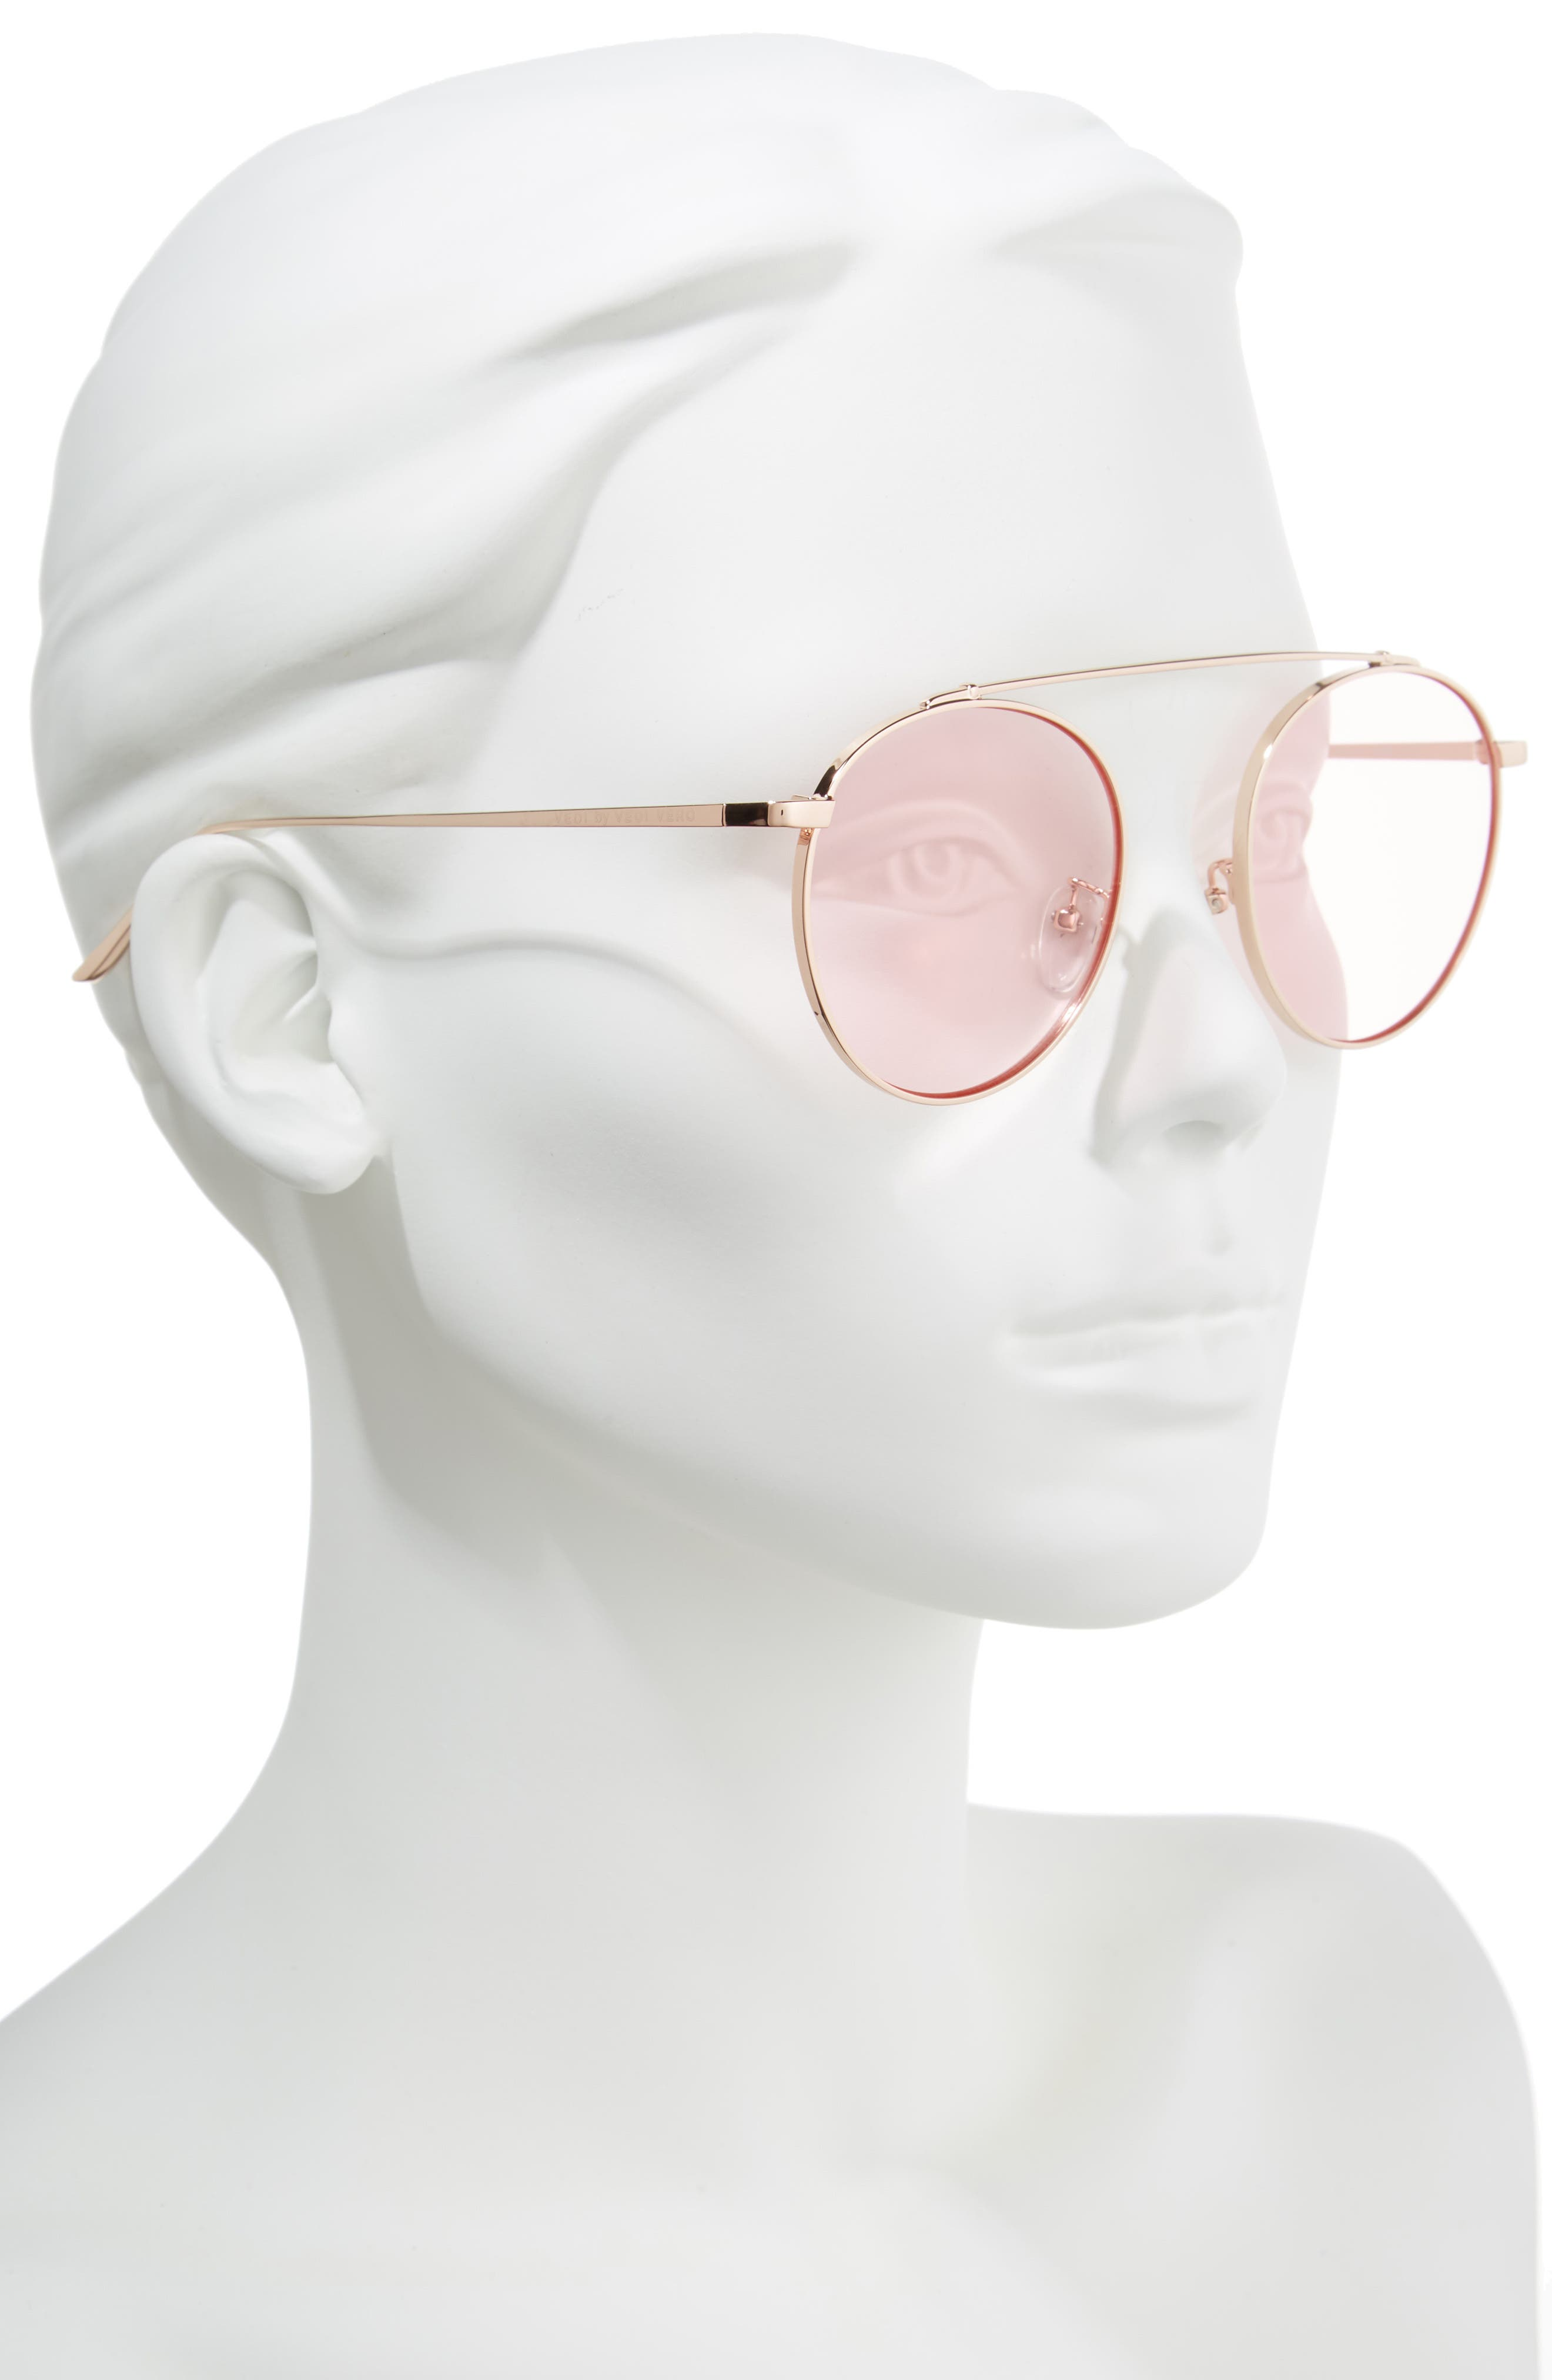 53mm Round Sunglasses,                             Alternate thumbnail 2, color,                             Rosegld/Pink